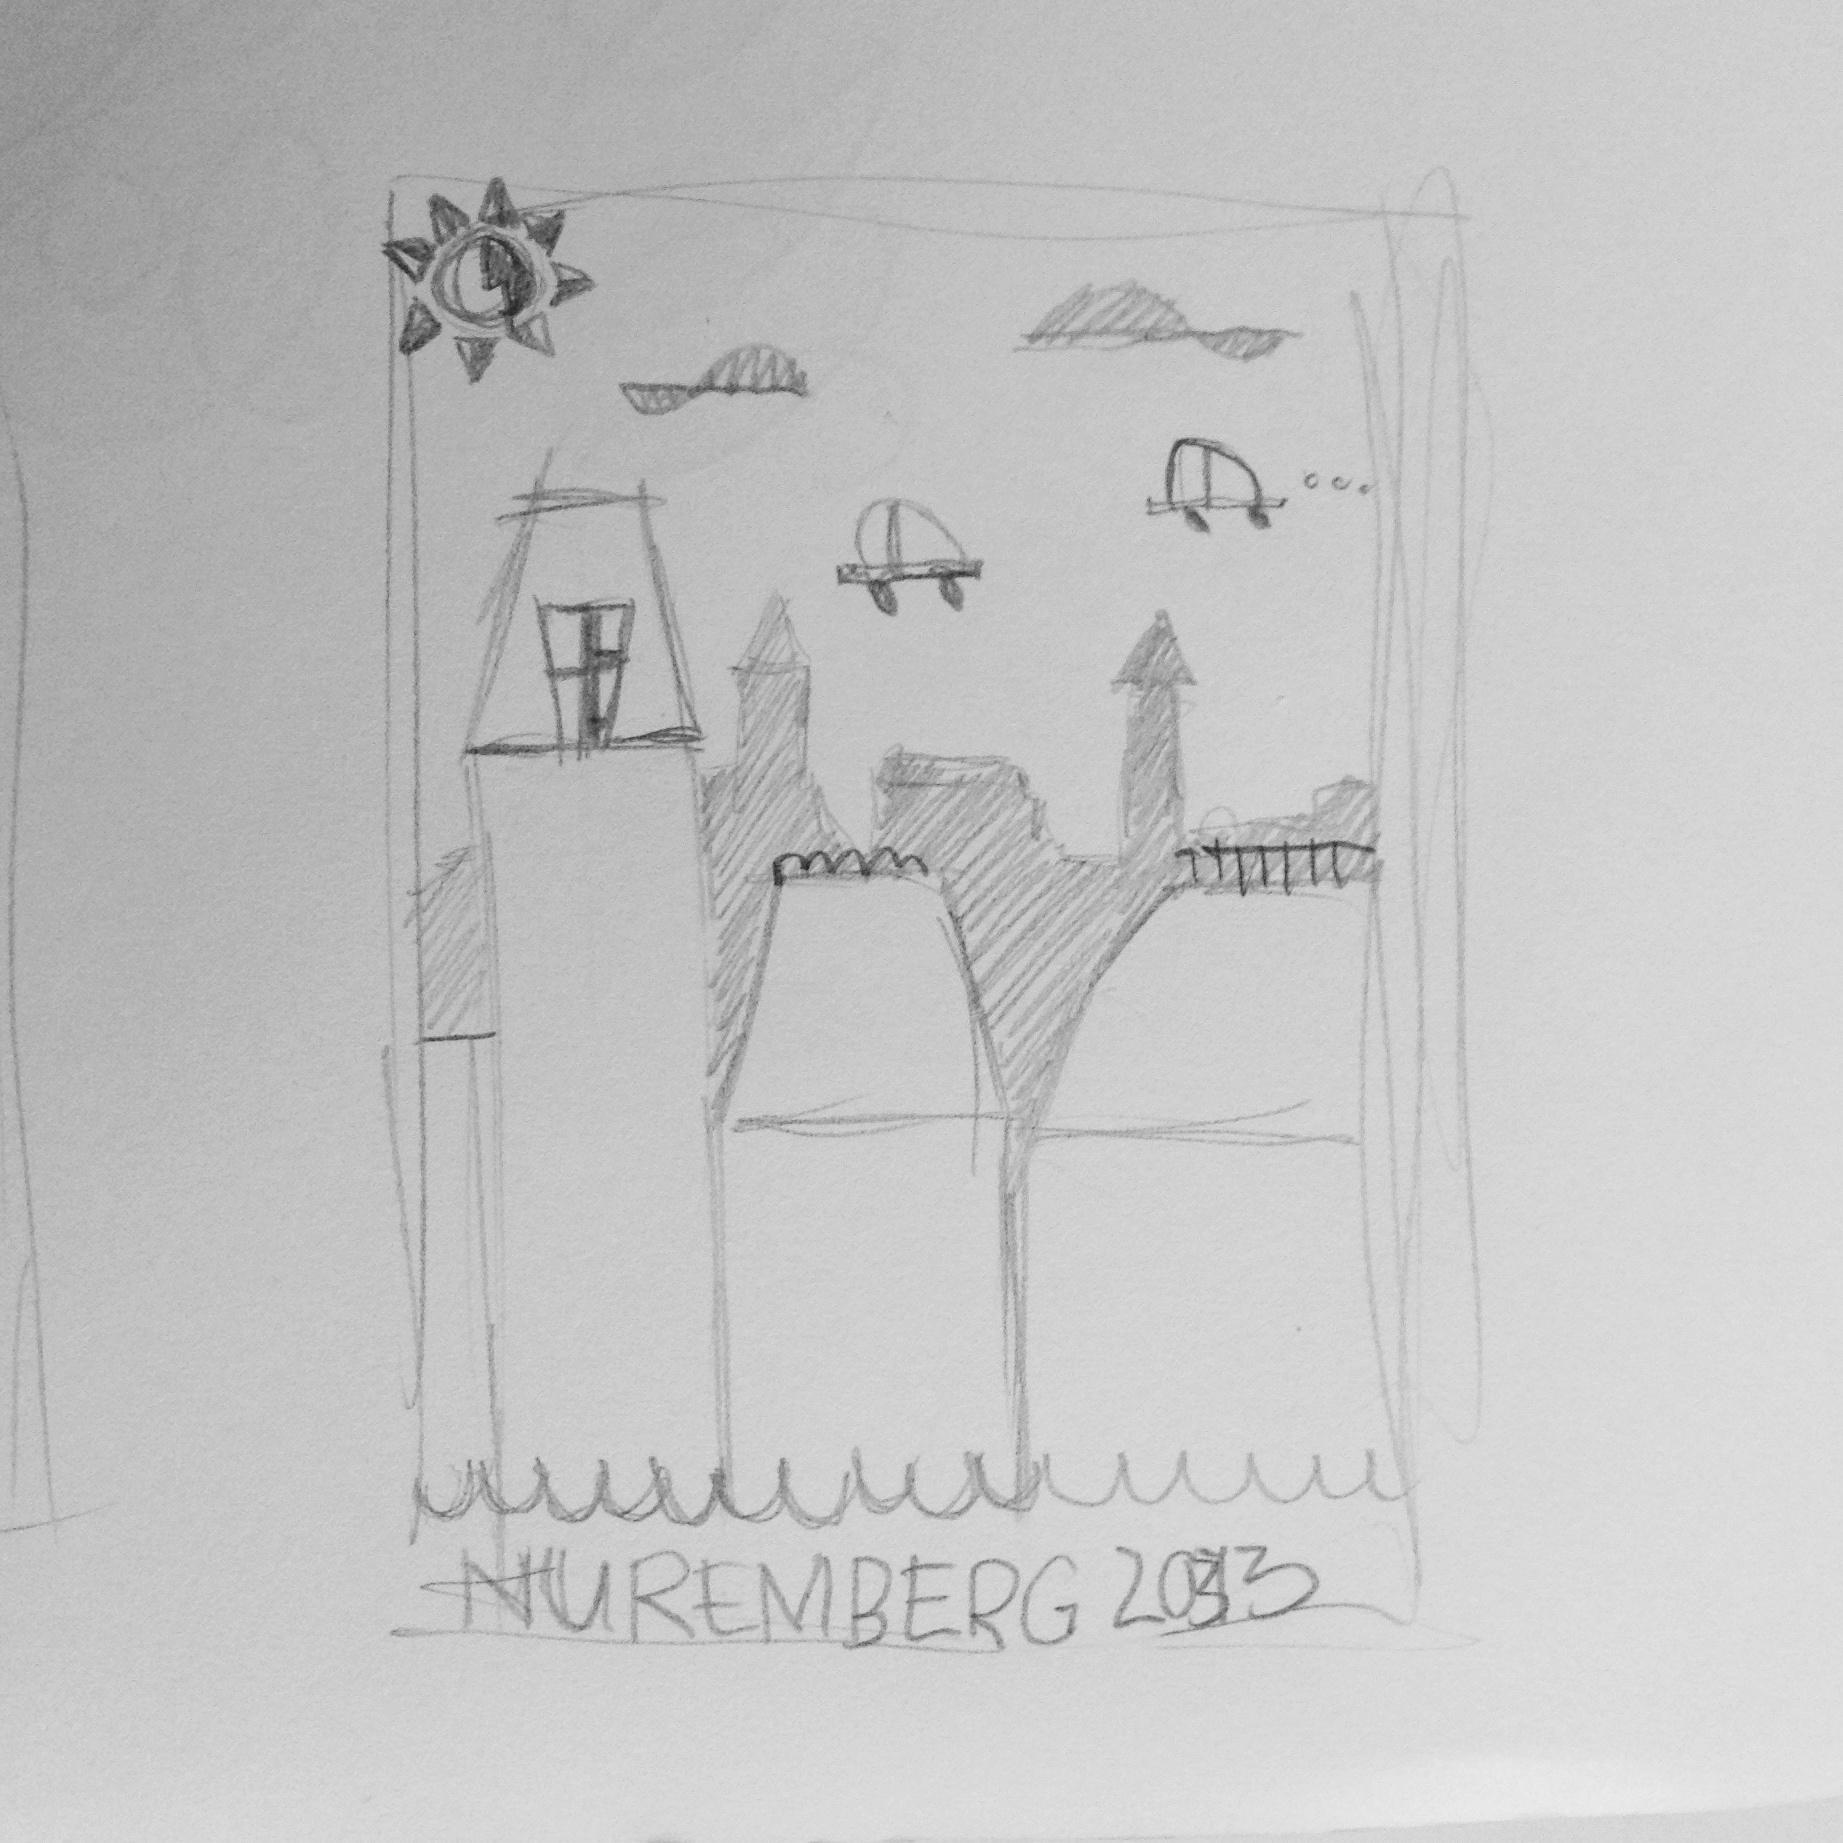 Nuremberg - image 6 - student project